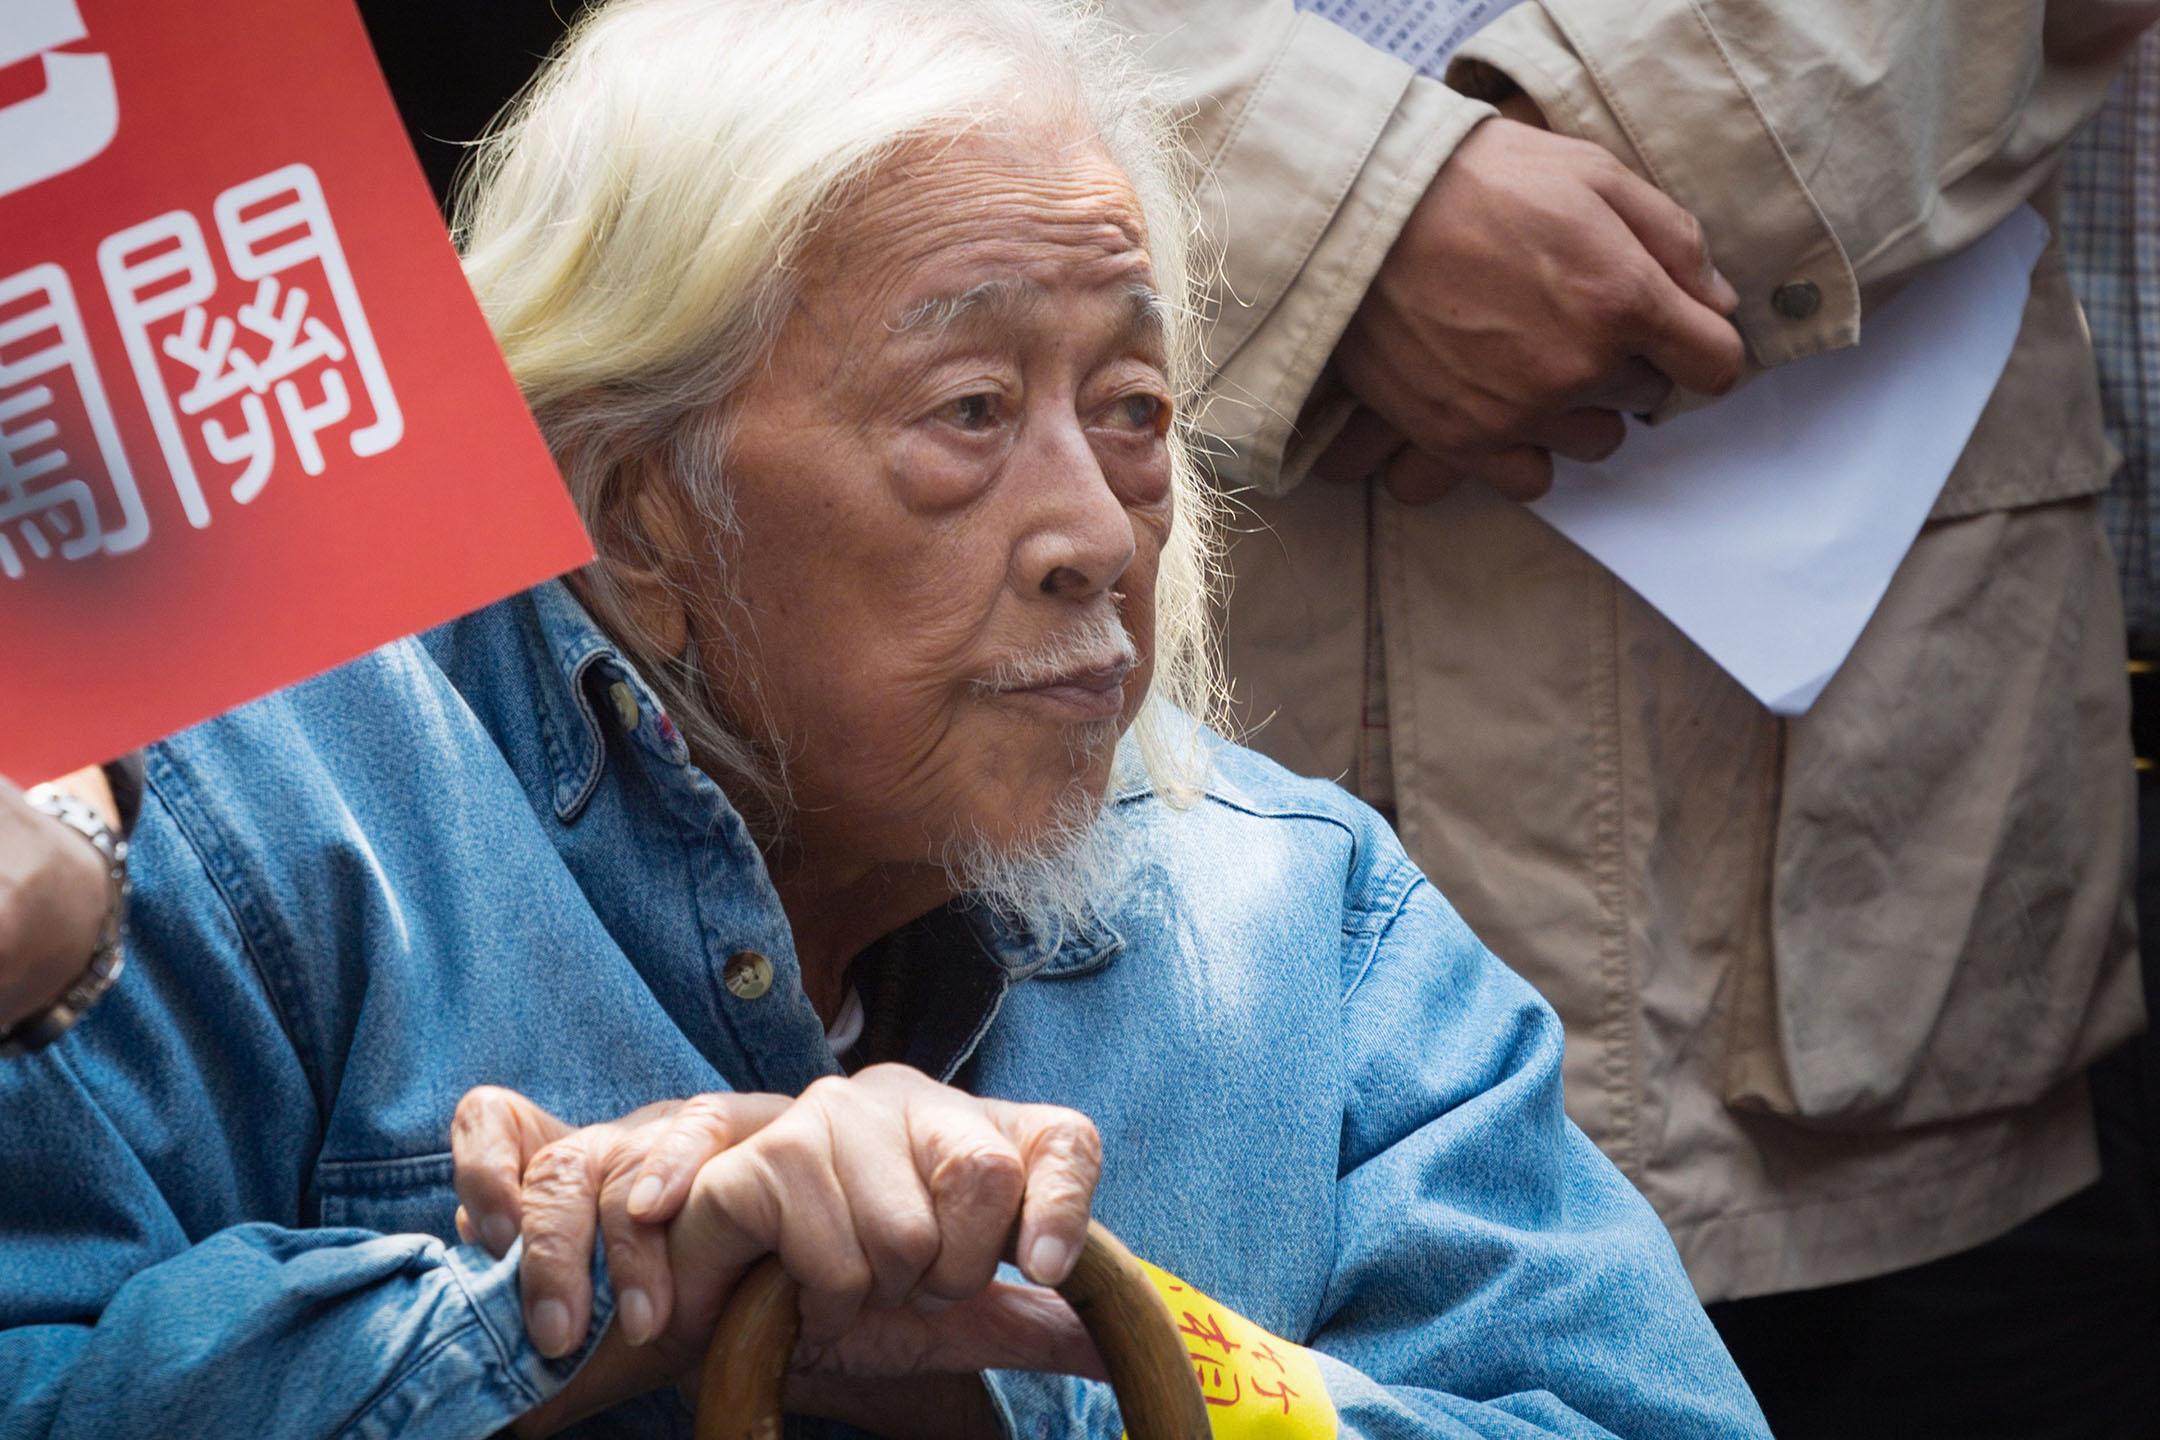 台獨運動先驅人物史明逝世,享年103歲。 Craig Ferguson/LightRocket via Getty Images